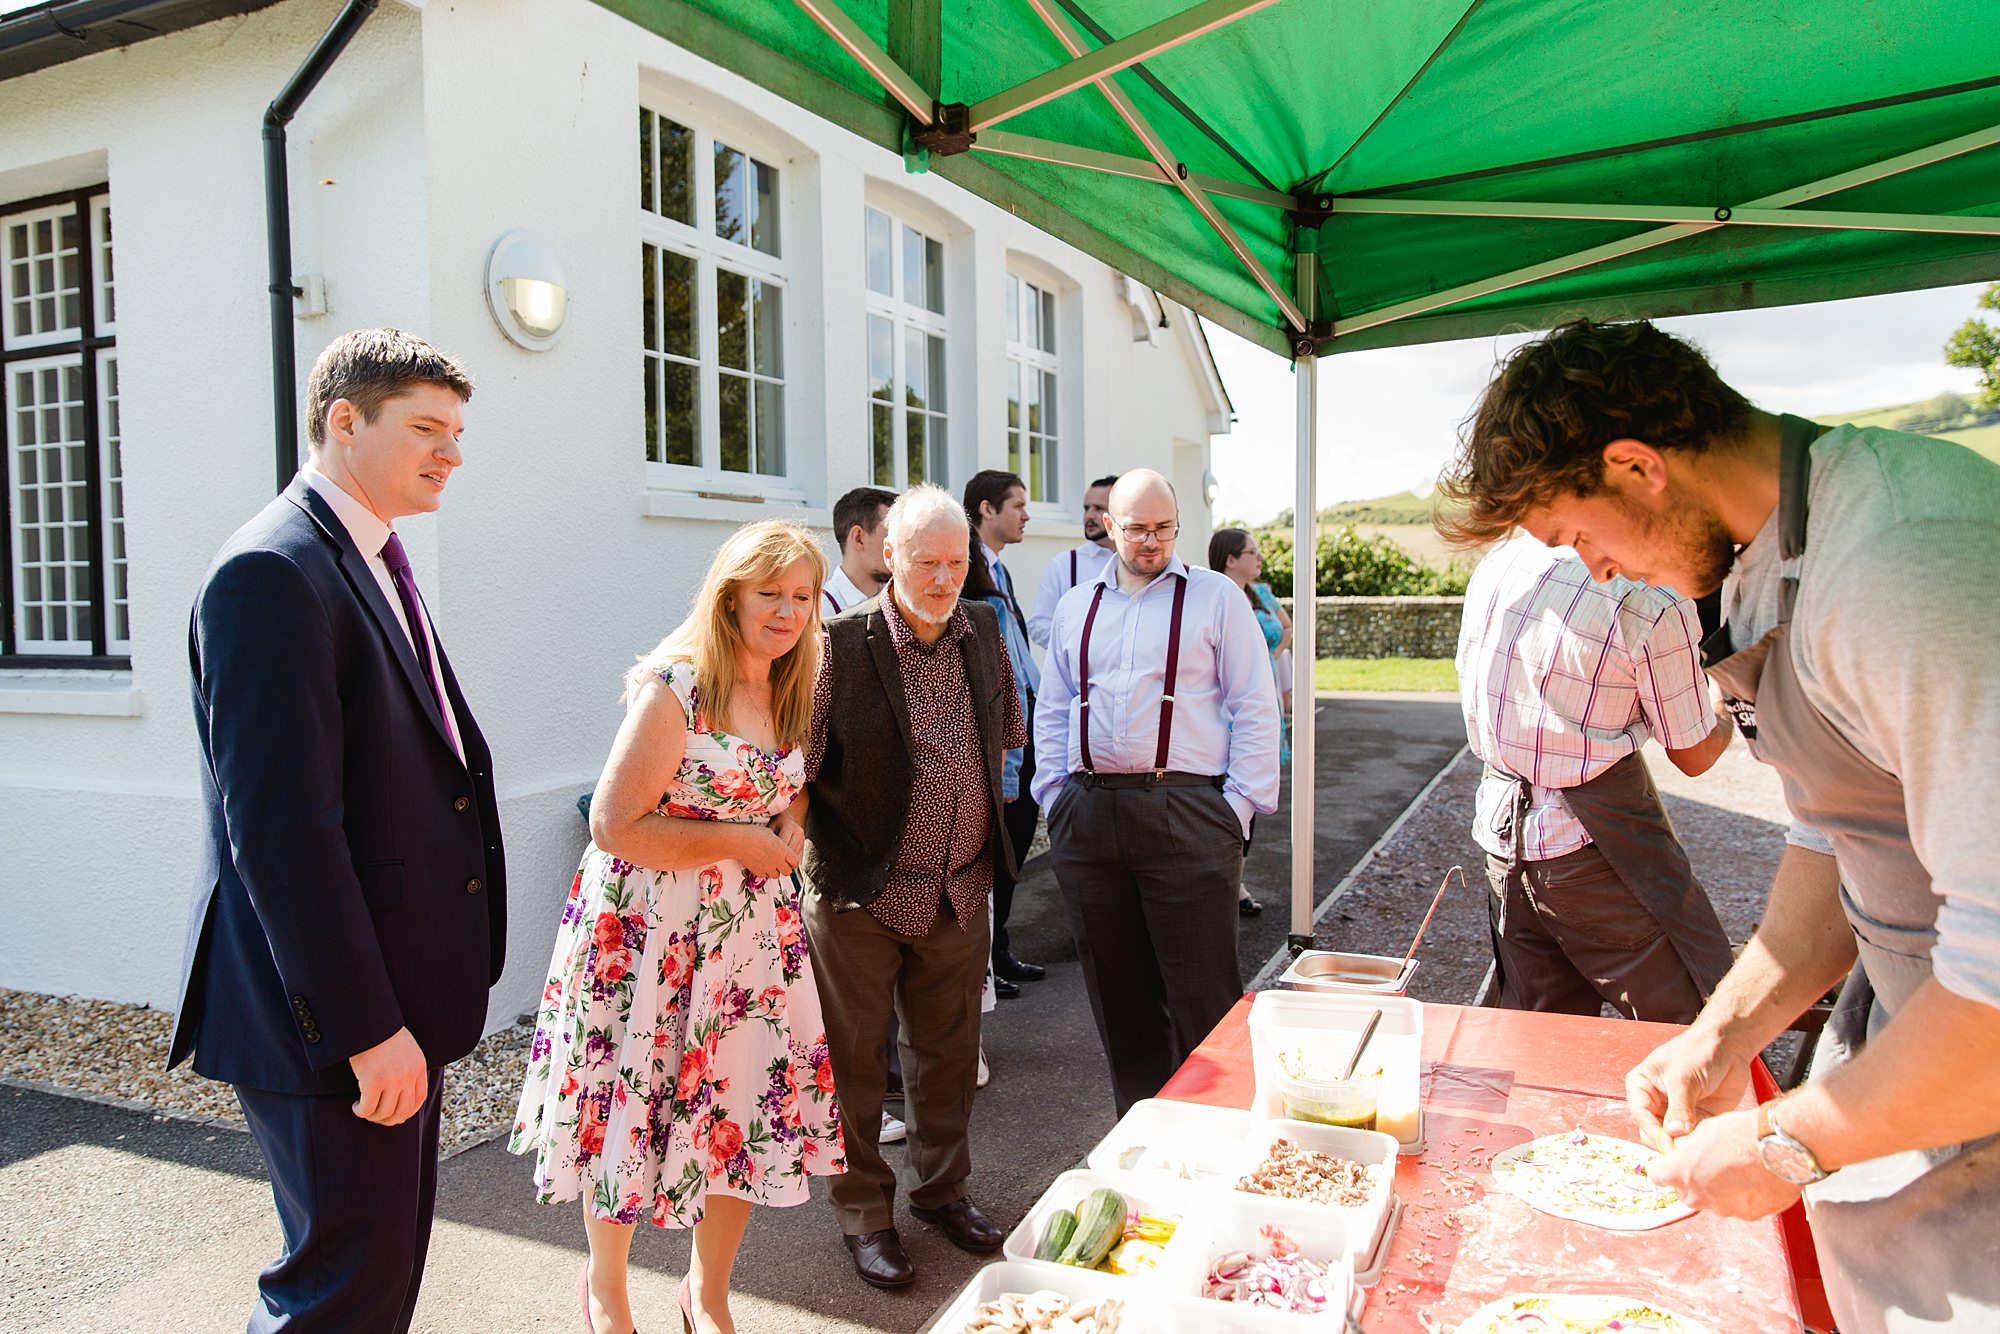 Fun village hall wedding guests enjoying pizza van